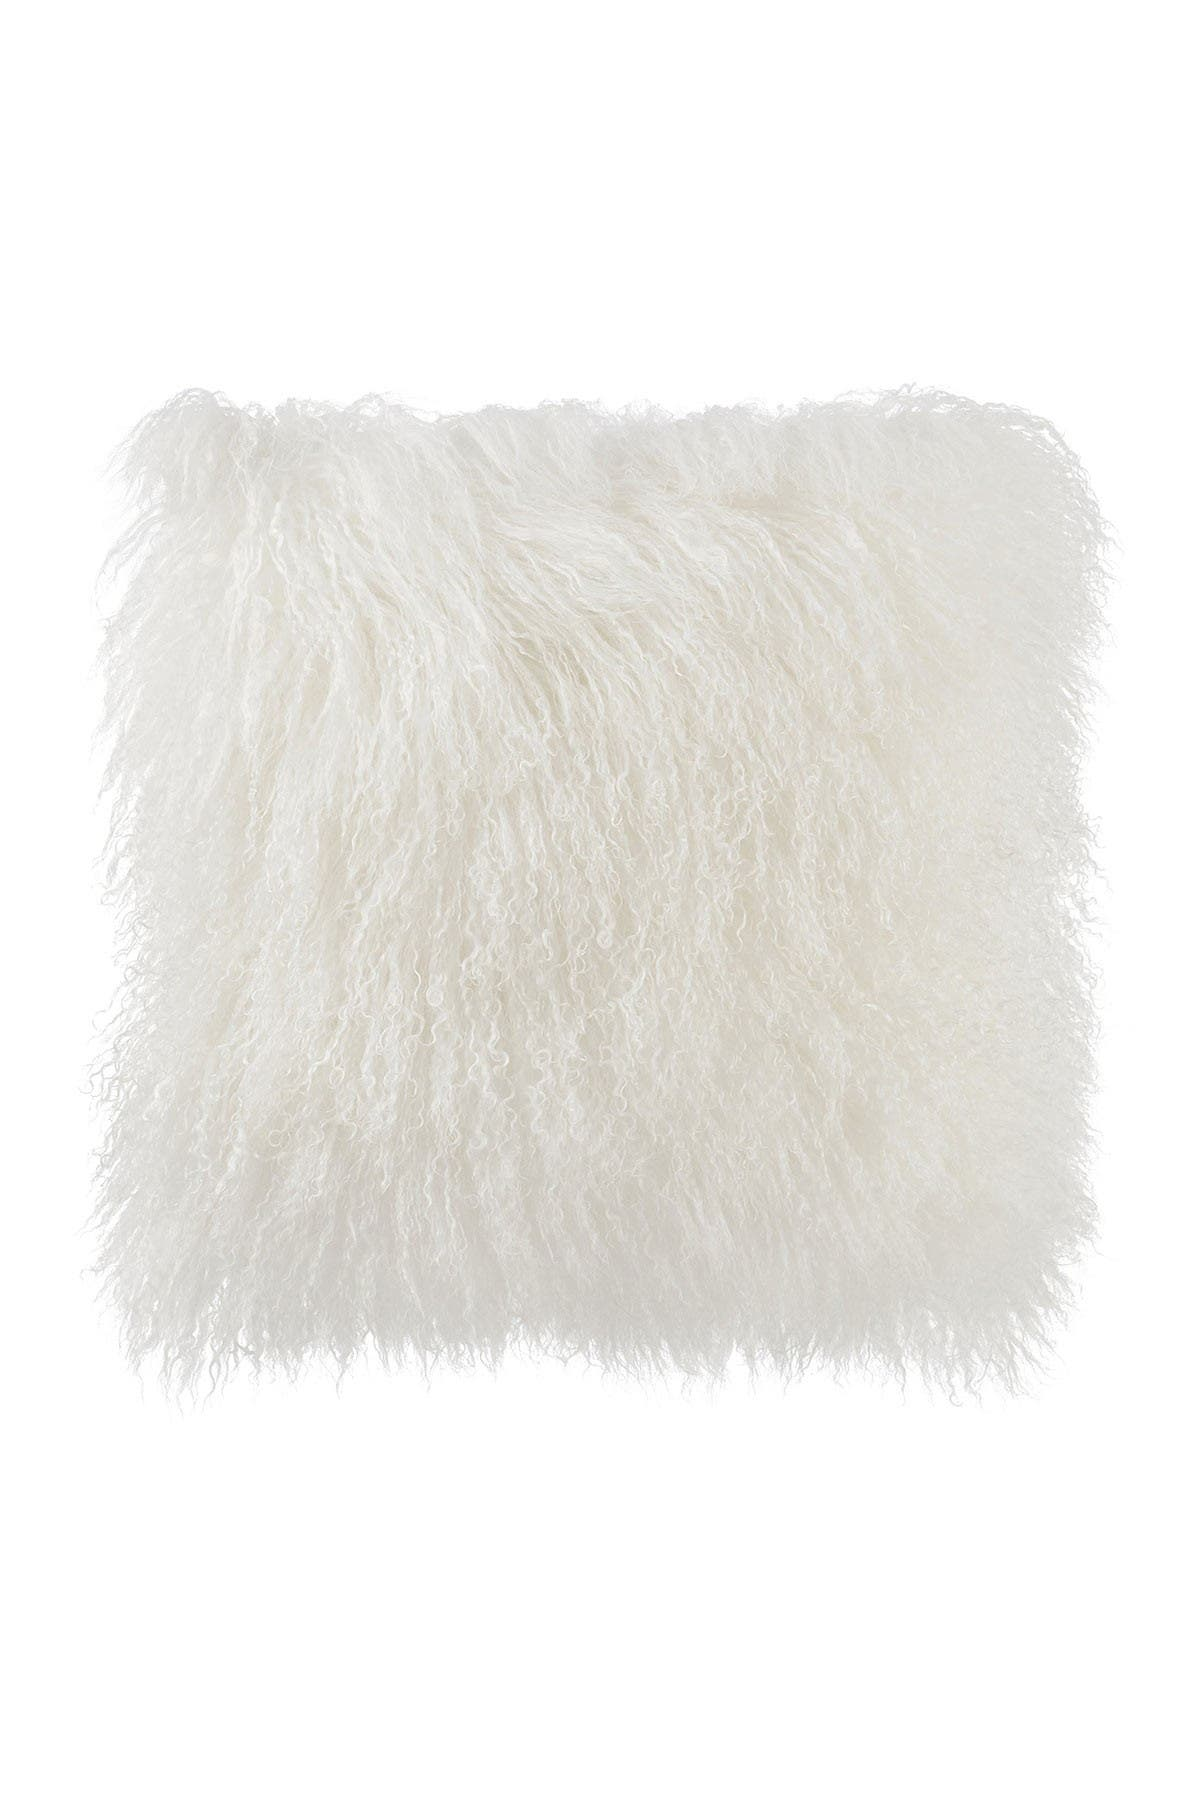 Image of TOV Furniture White Tibetan Sheep Pillow